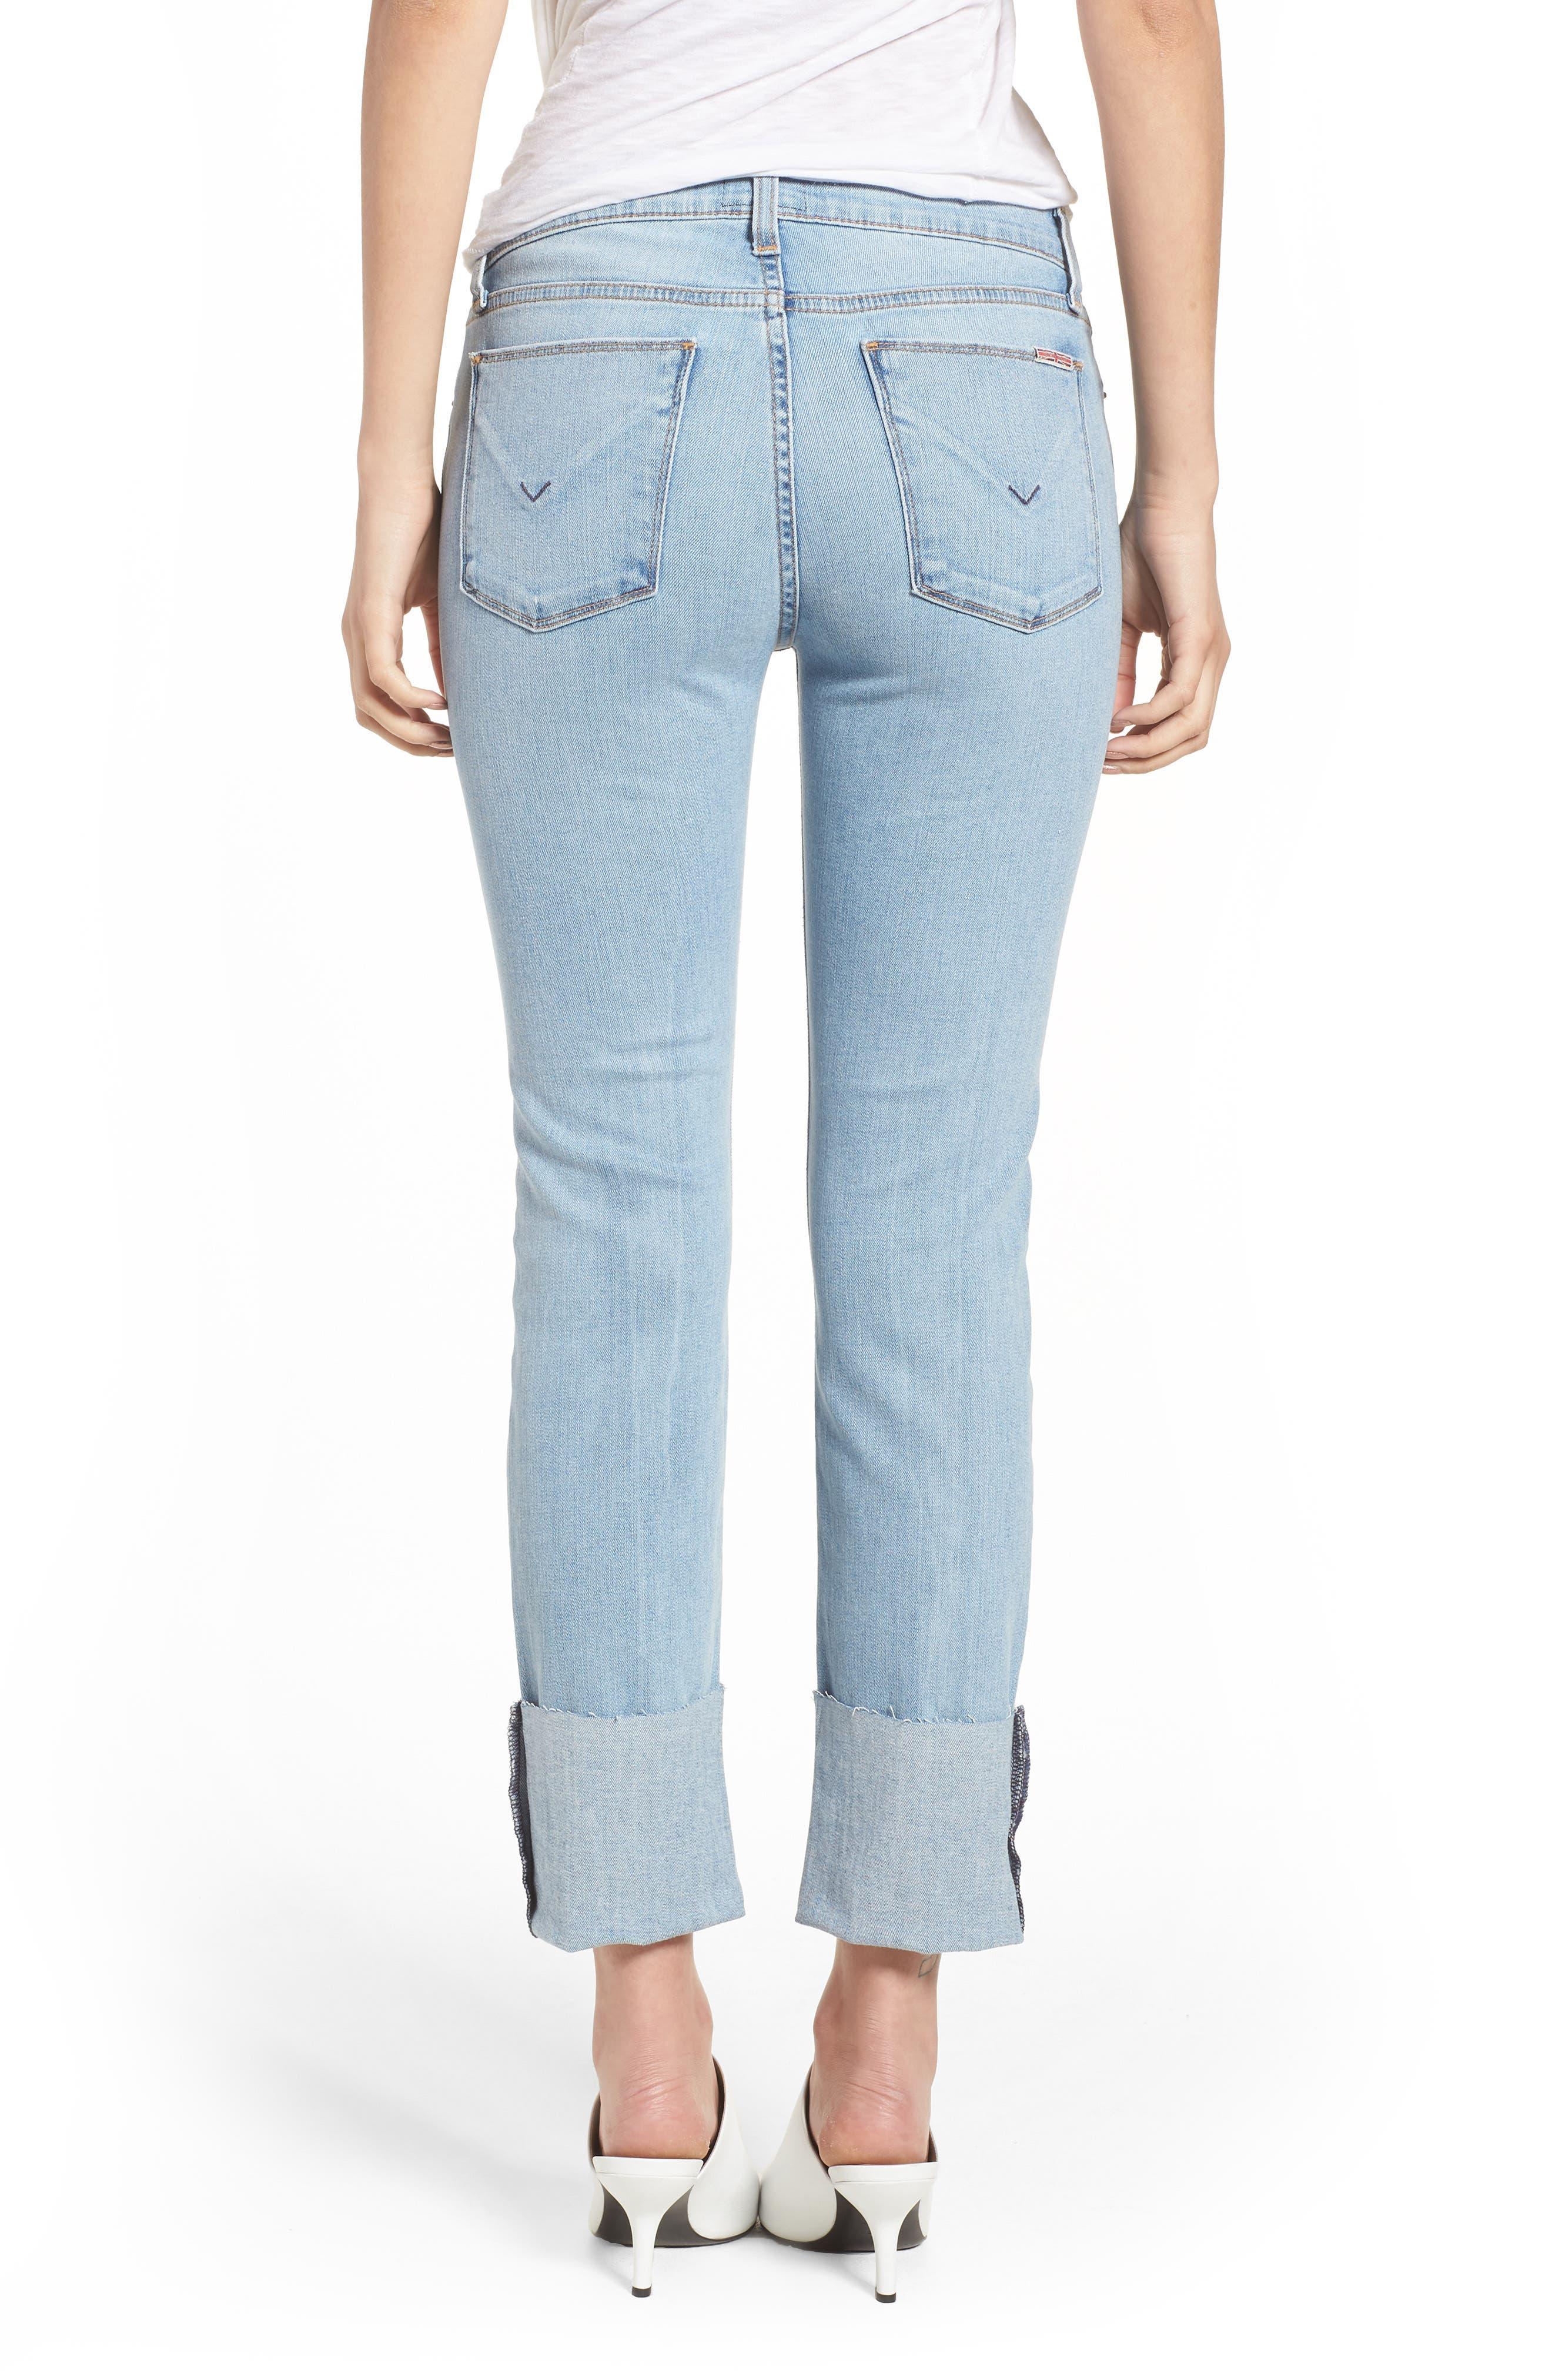 Tally Cuffed Crop Skinny Jeans,                             Alternate thumbnail 2, color,                             Gemini